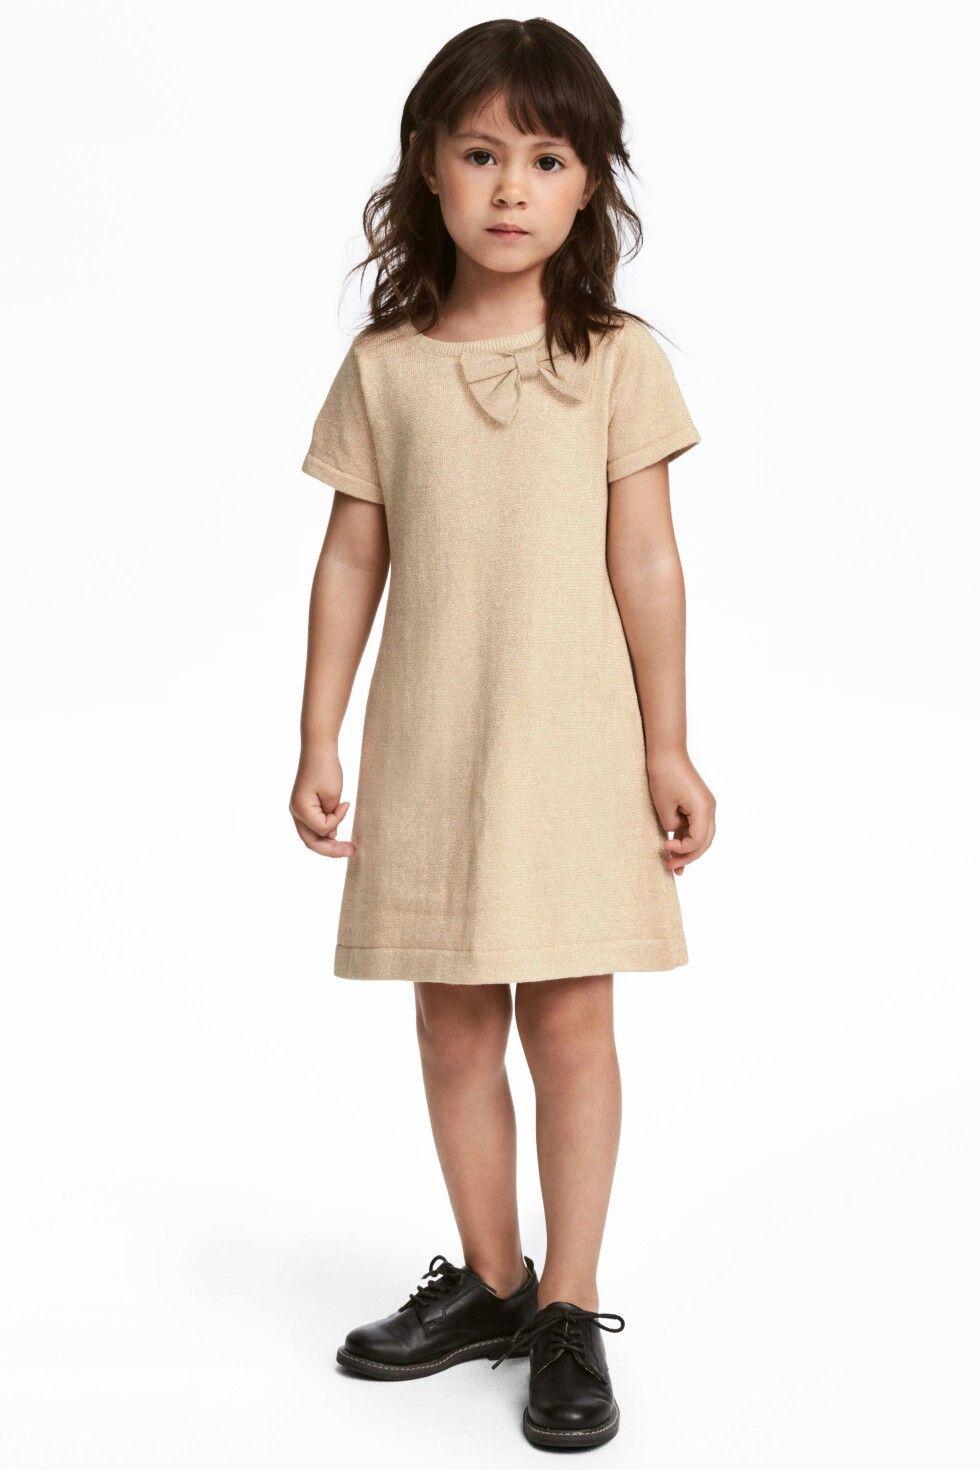 Pin by malwina marszalska on ubrania dla dzieci pinterest